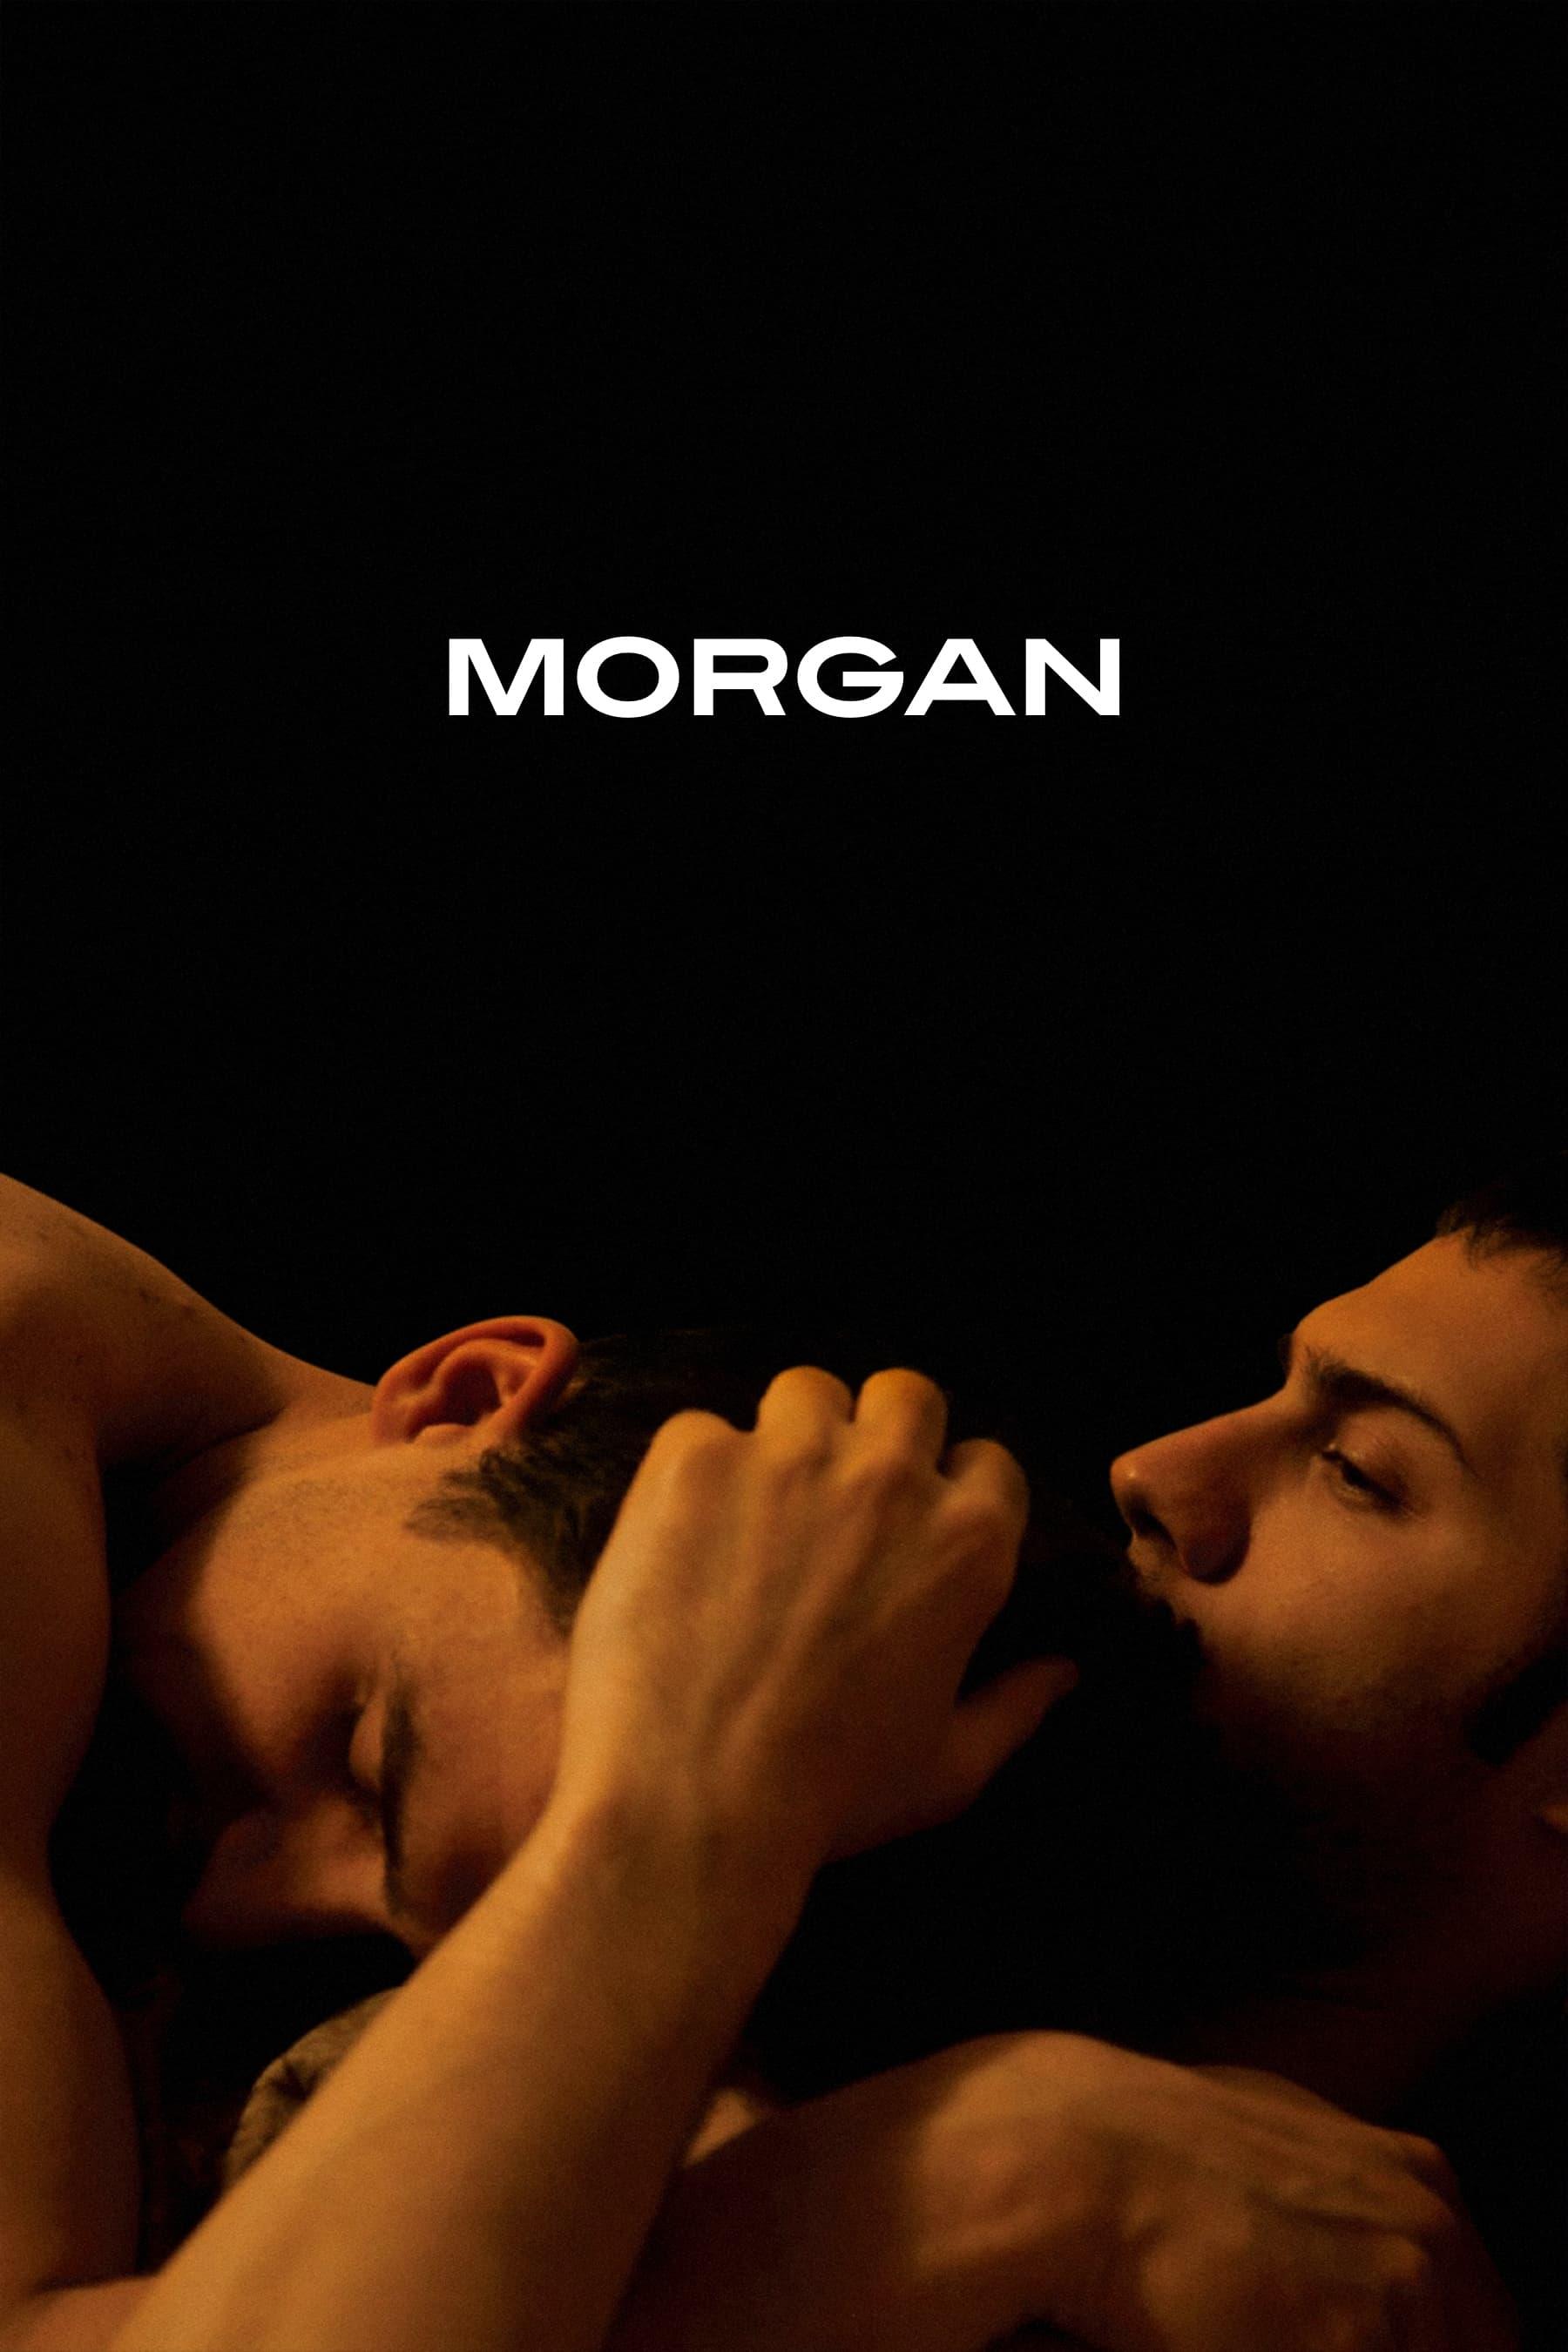 Morgan (2012)